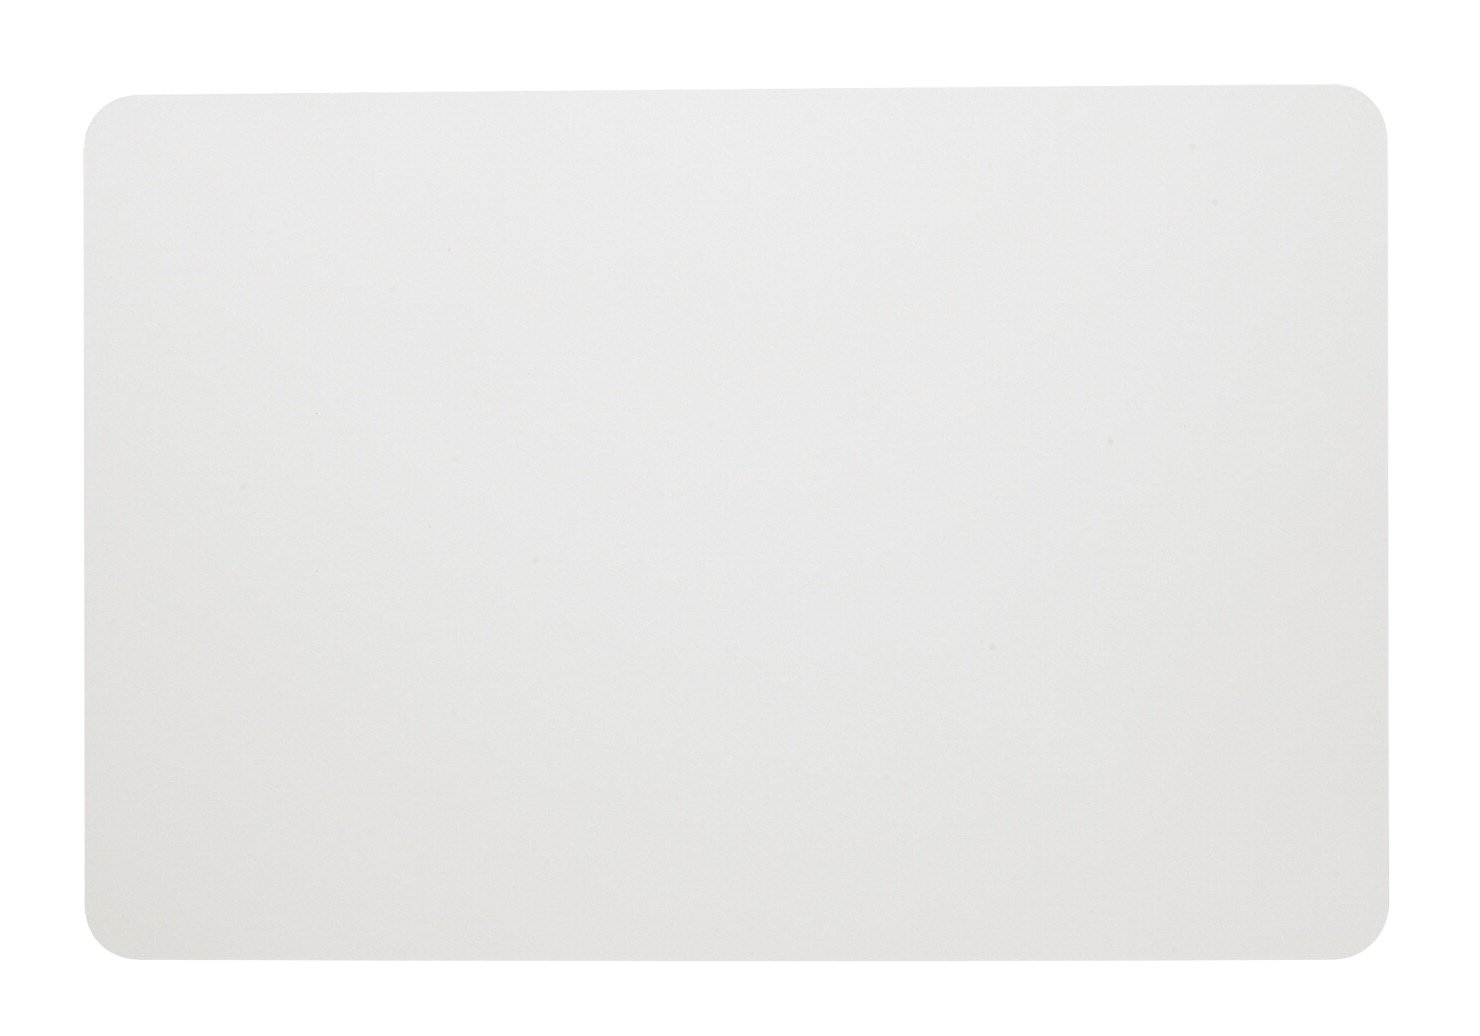 School Smart Dry-Erase Pupil Boards - 12 x 18 - Unruled - Set of 10